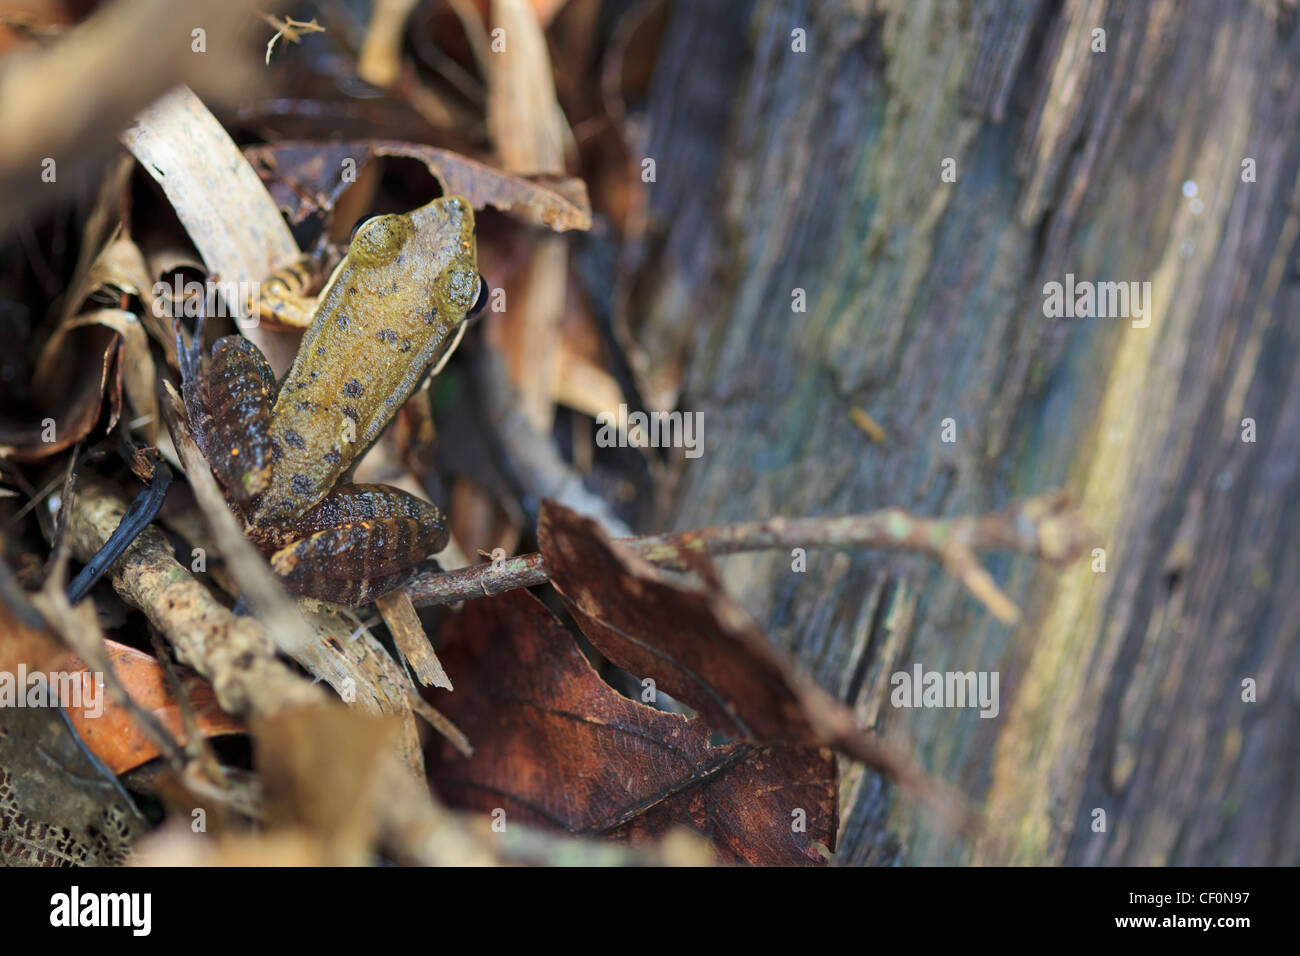 Frog (Hylarana attigua) in a stream. Bach Ma National Park. Vietnam. - Stock Image